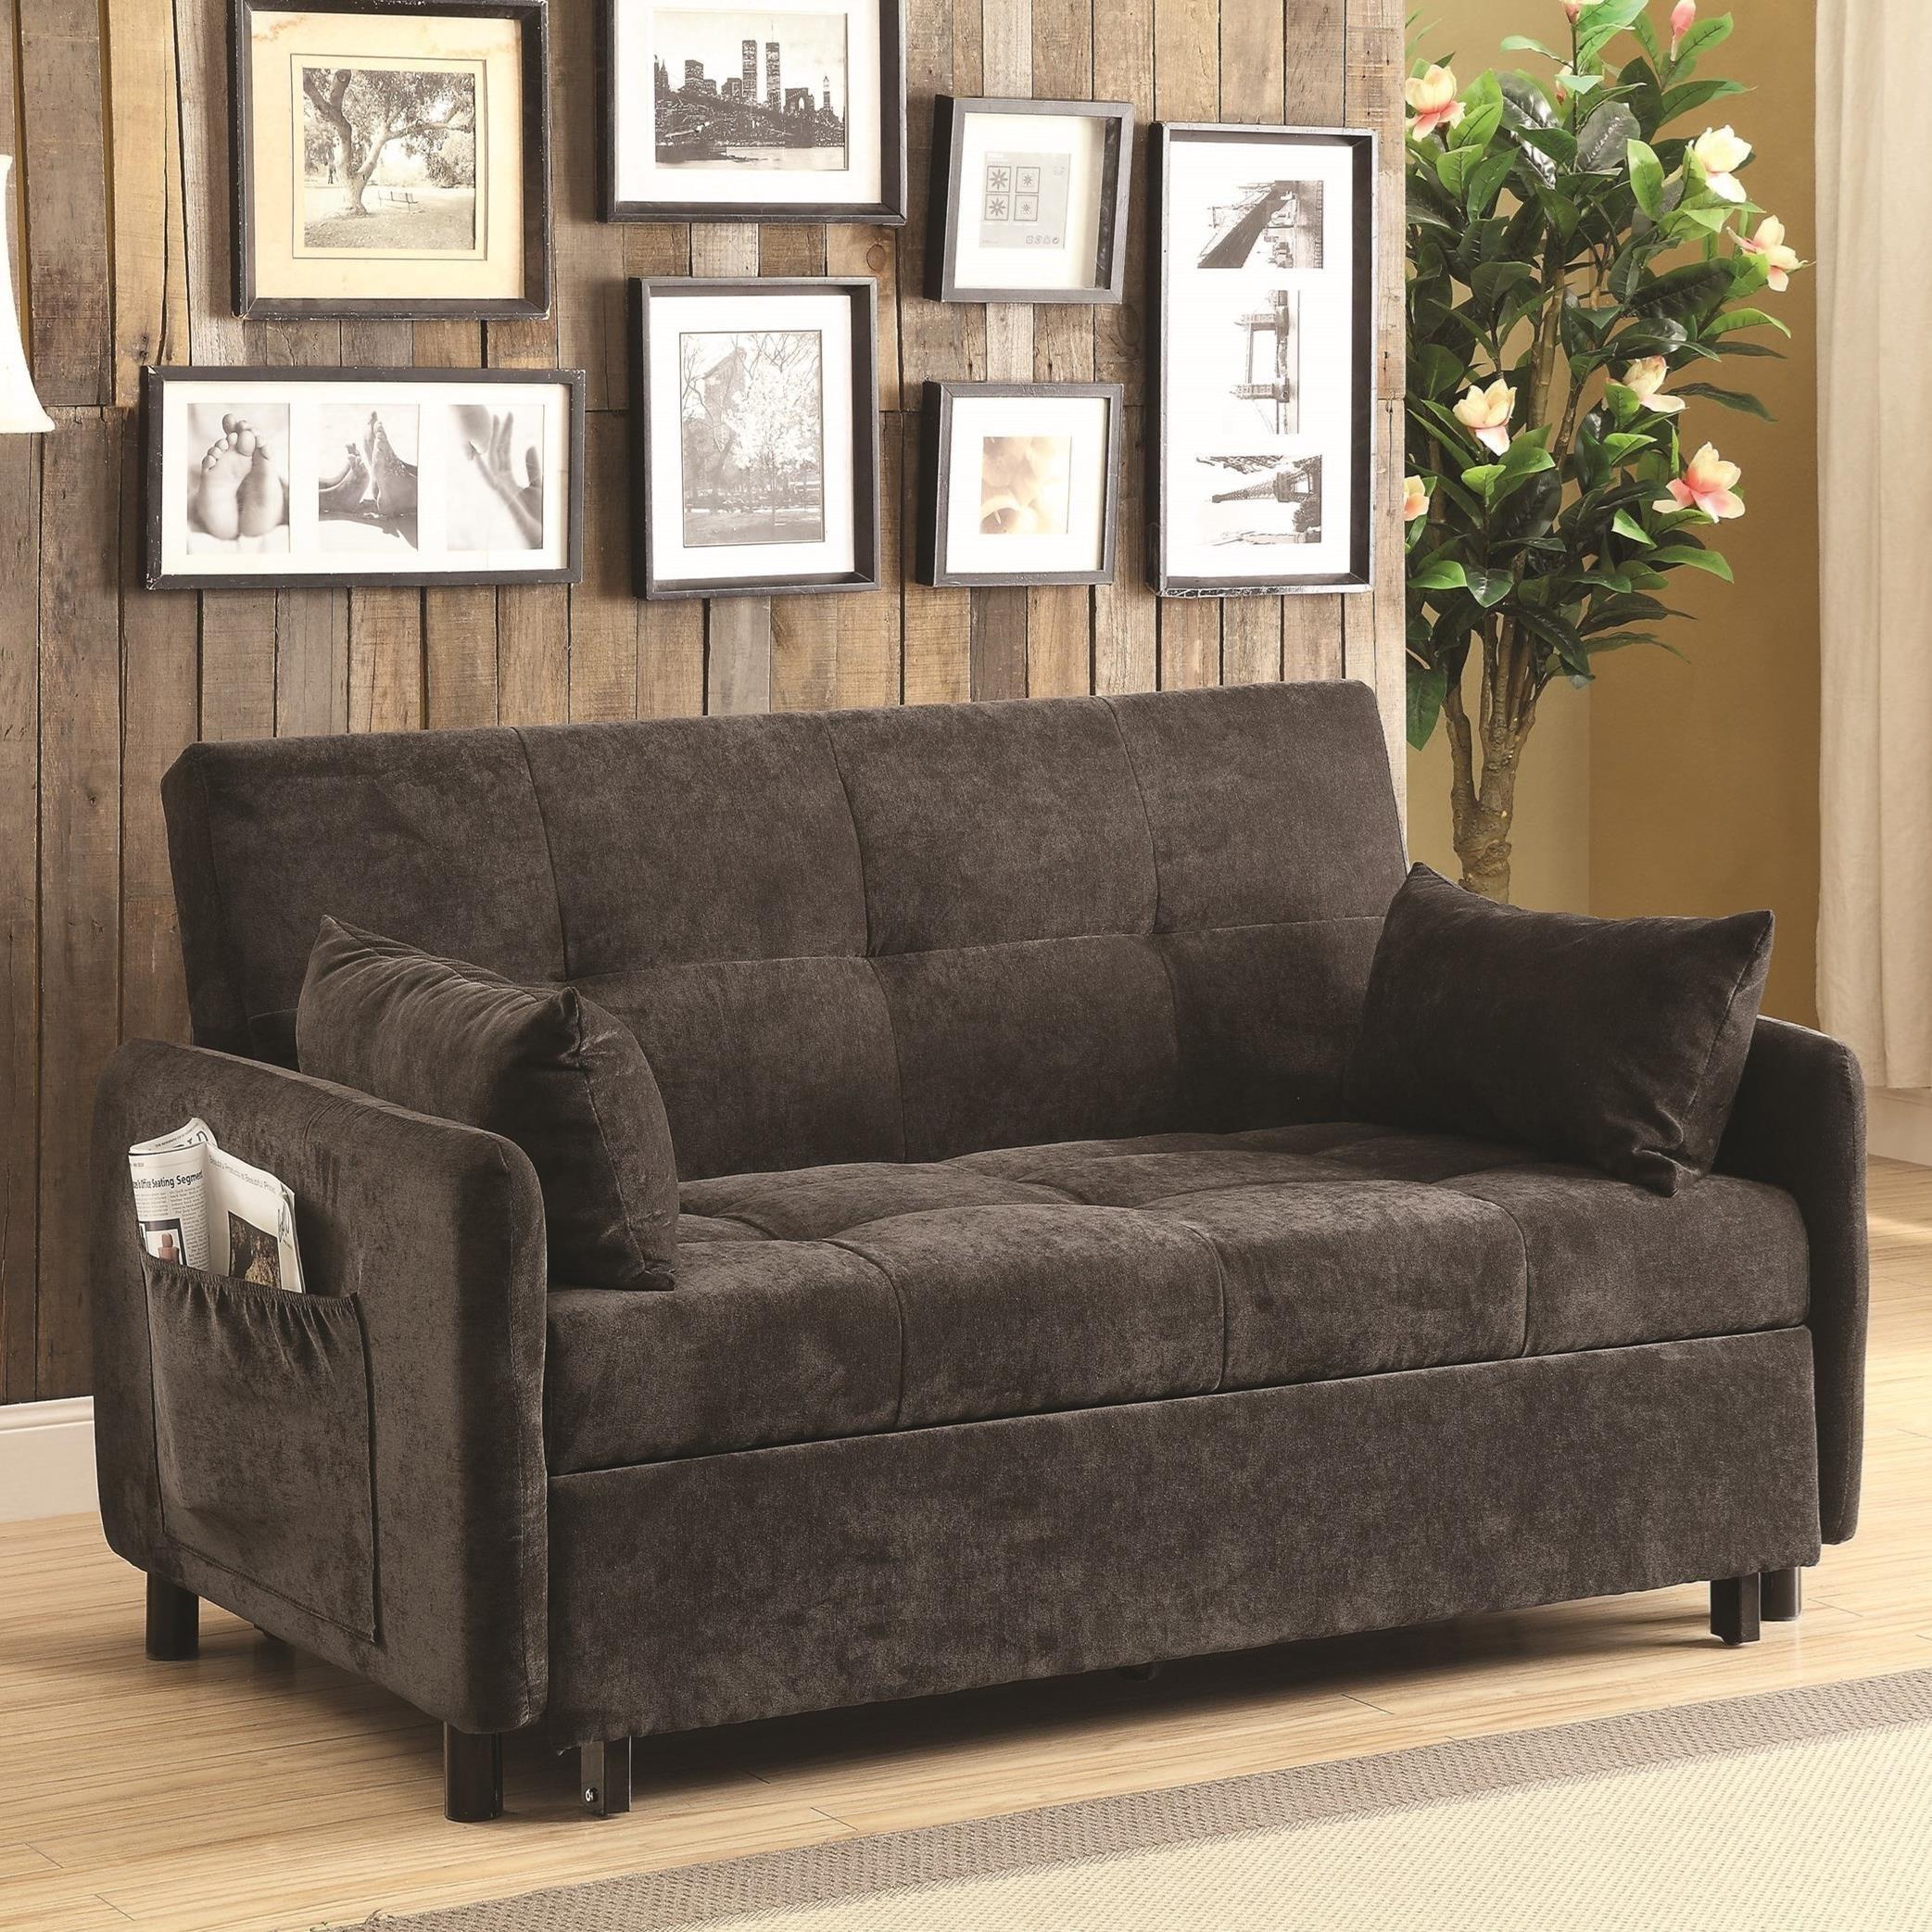 Coaster Futons 551075 Dark Brown Sofa Bed Dunk Bright Furniture Rh Dunkandbright Com